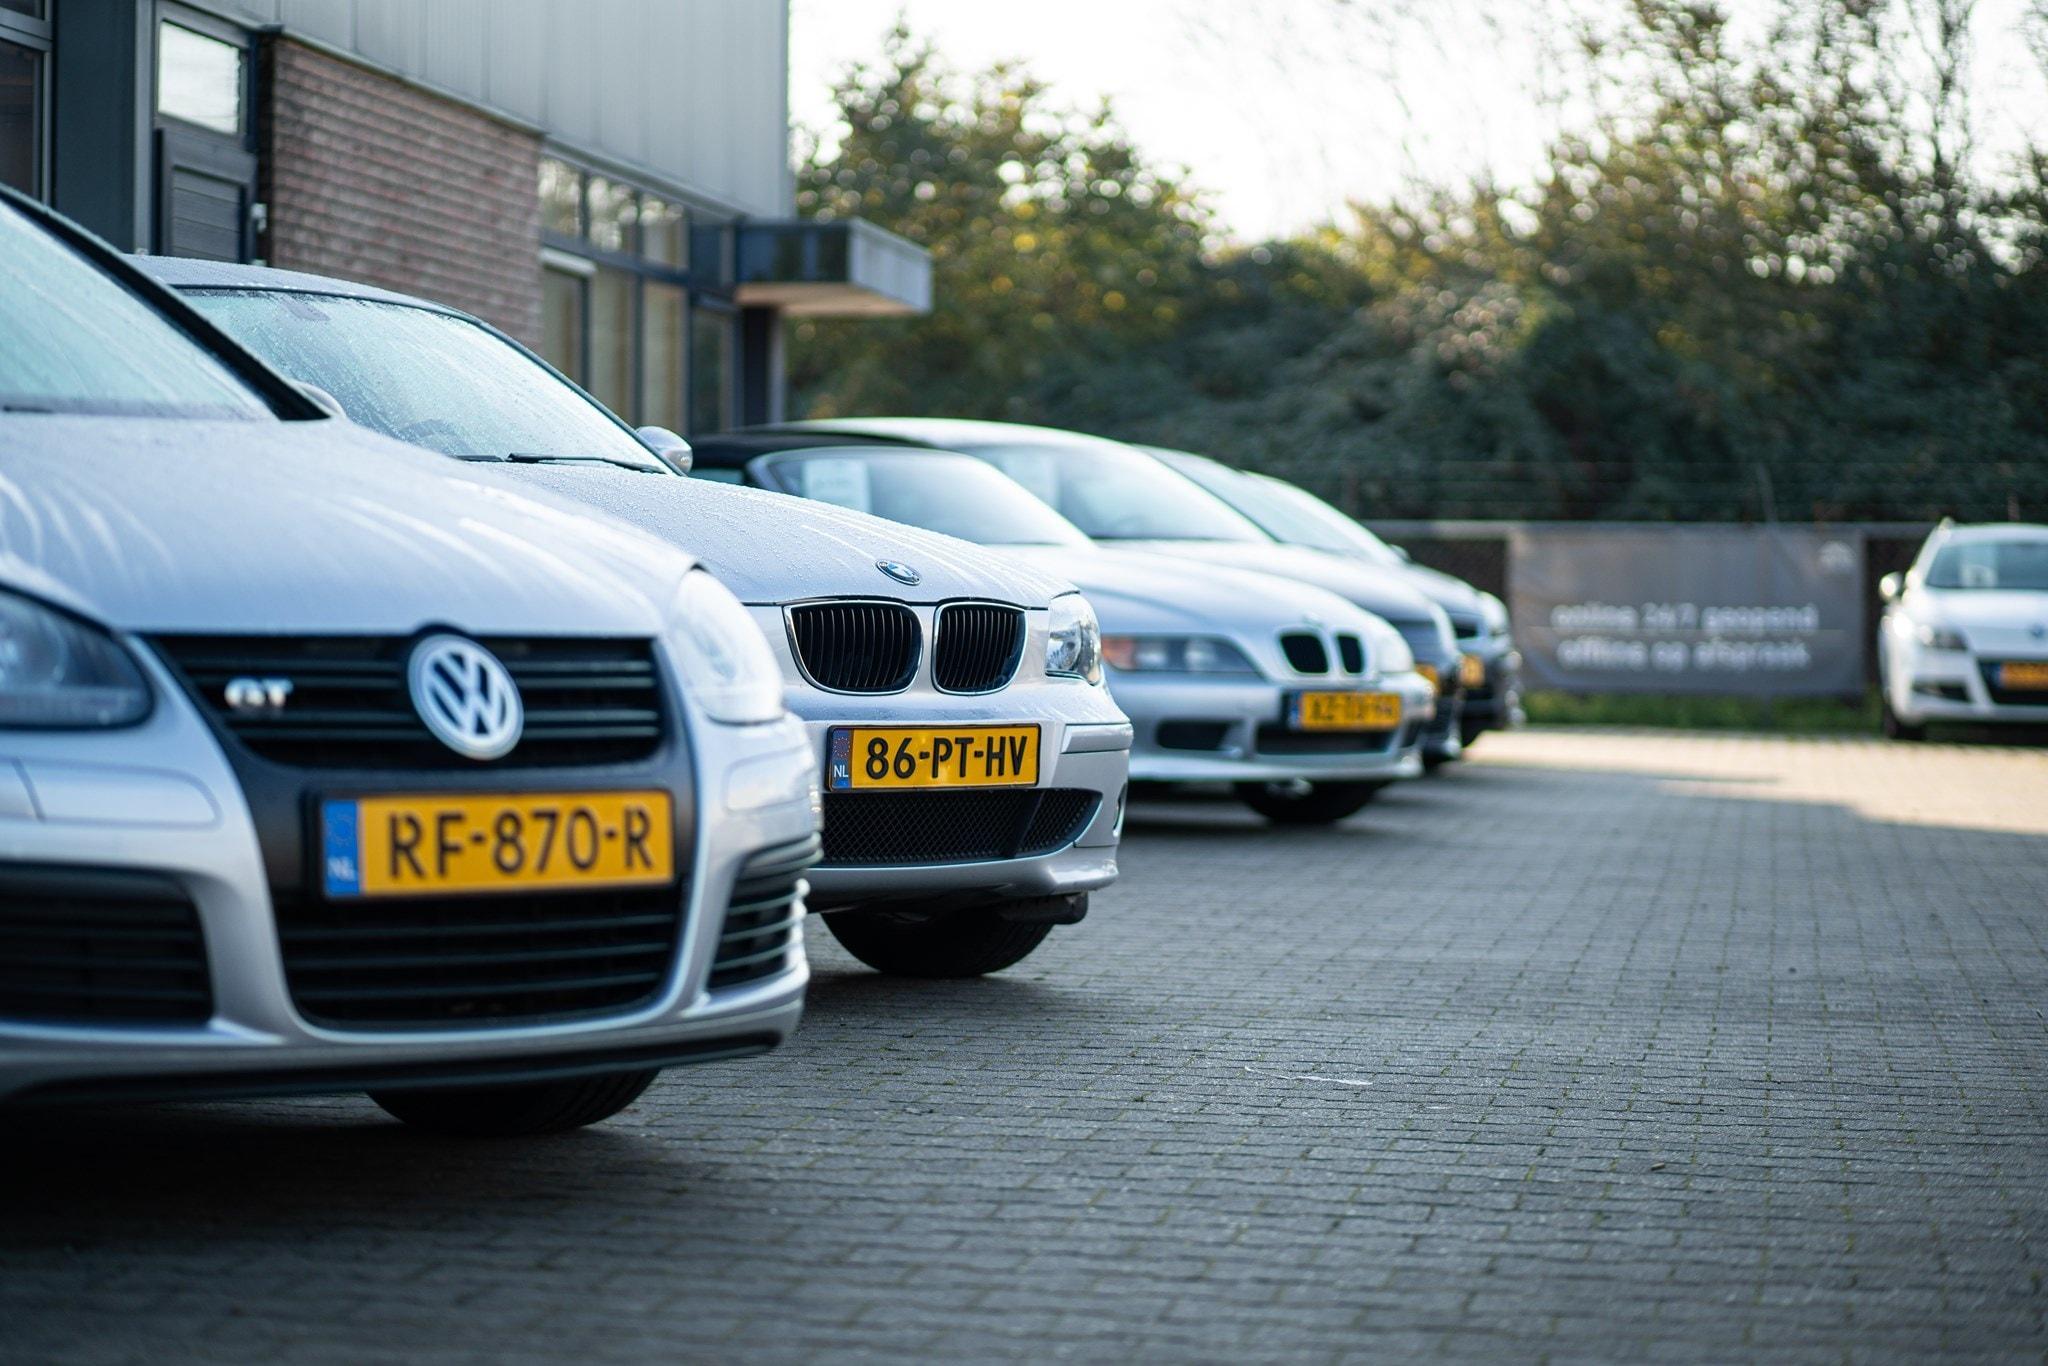 House of Cars Steenwijk